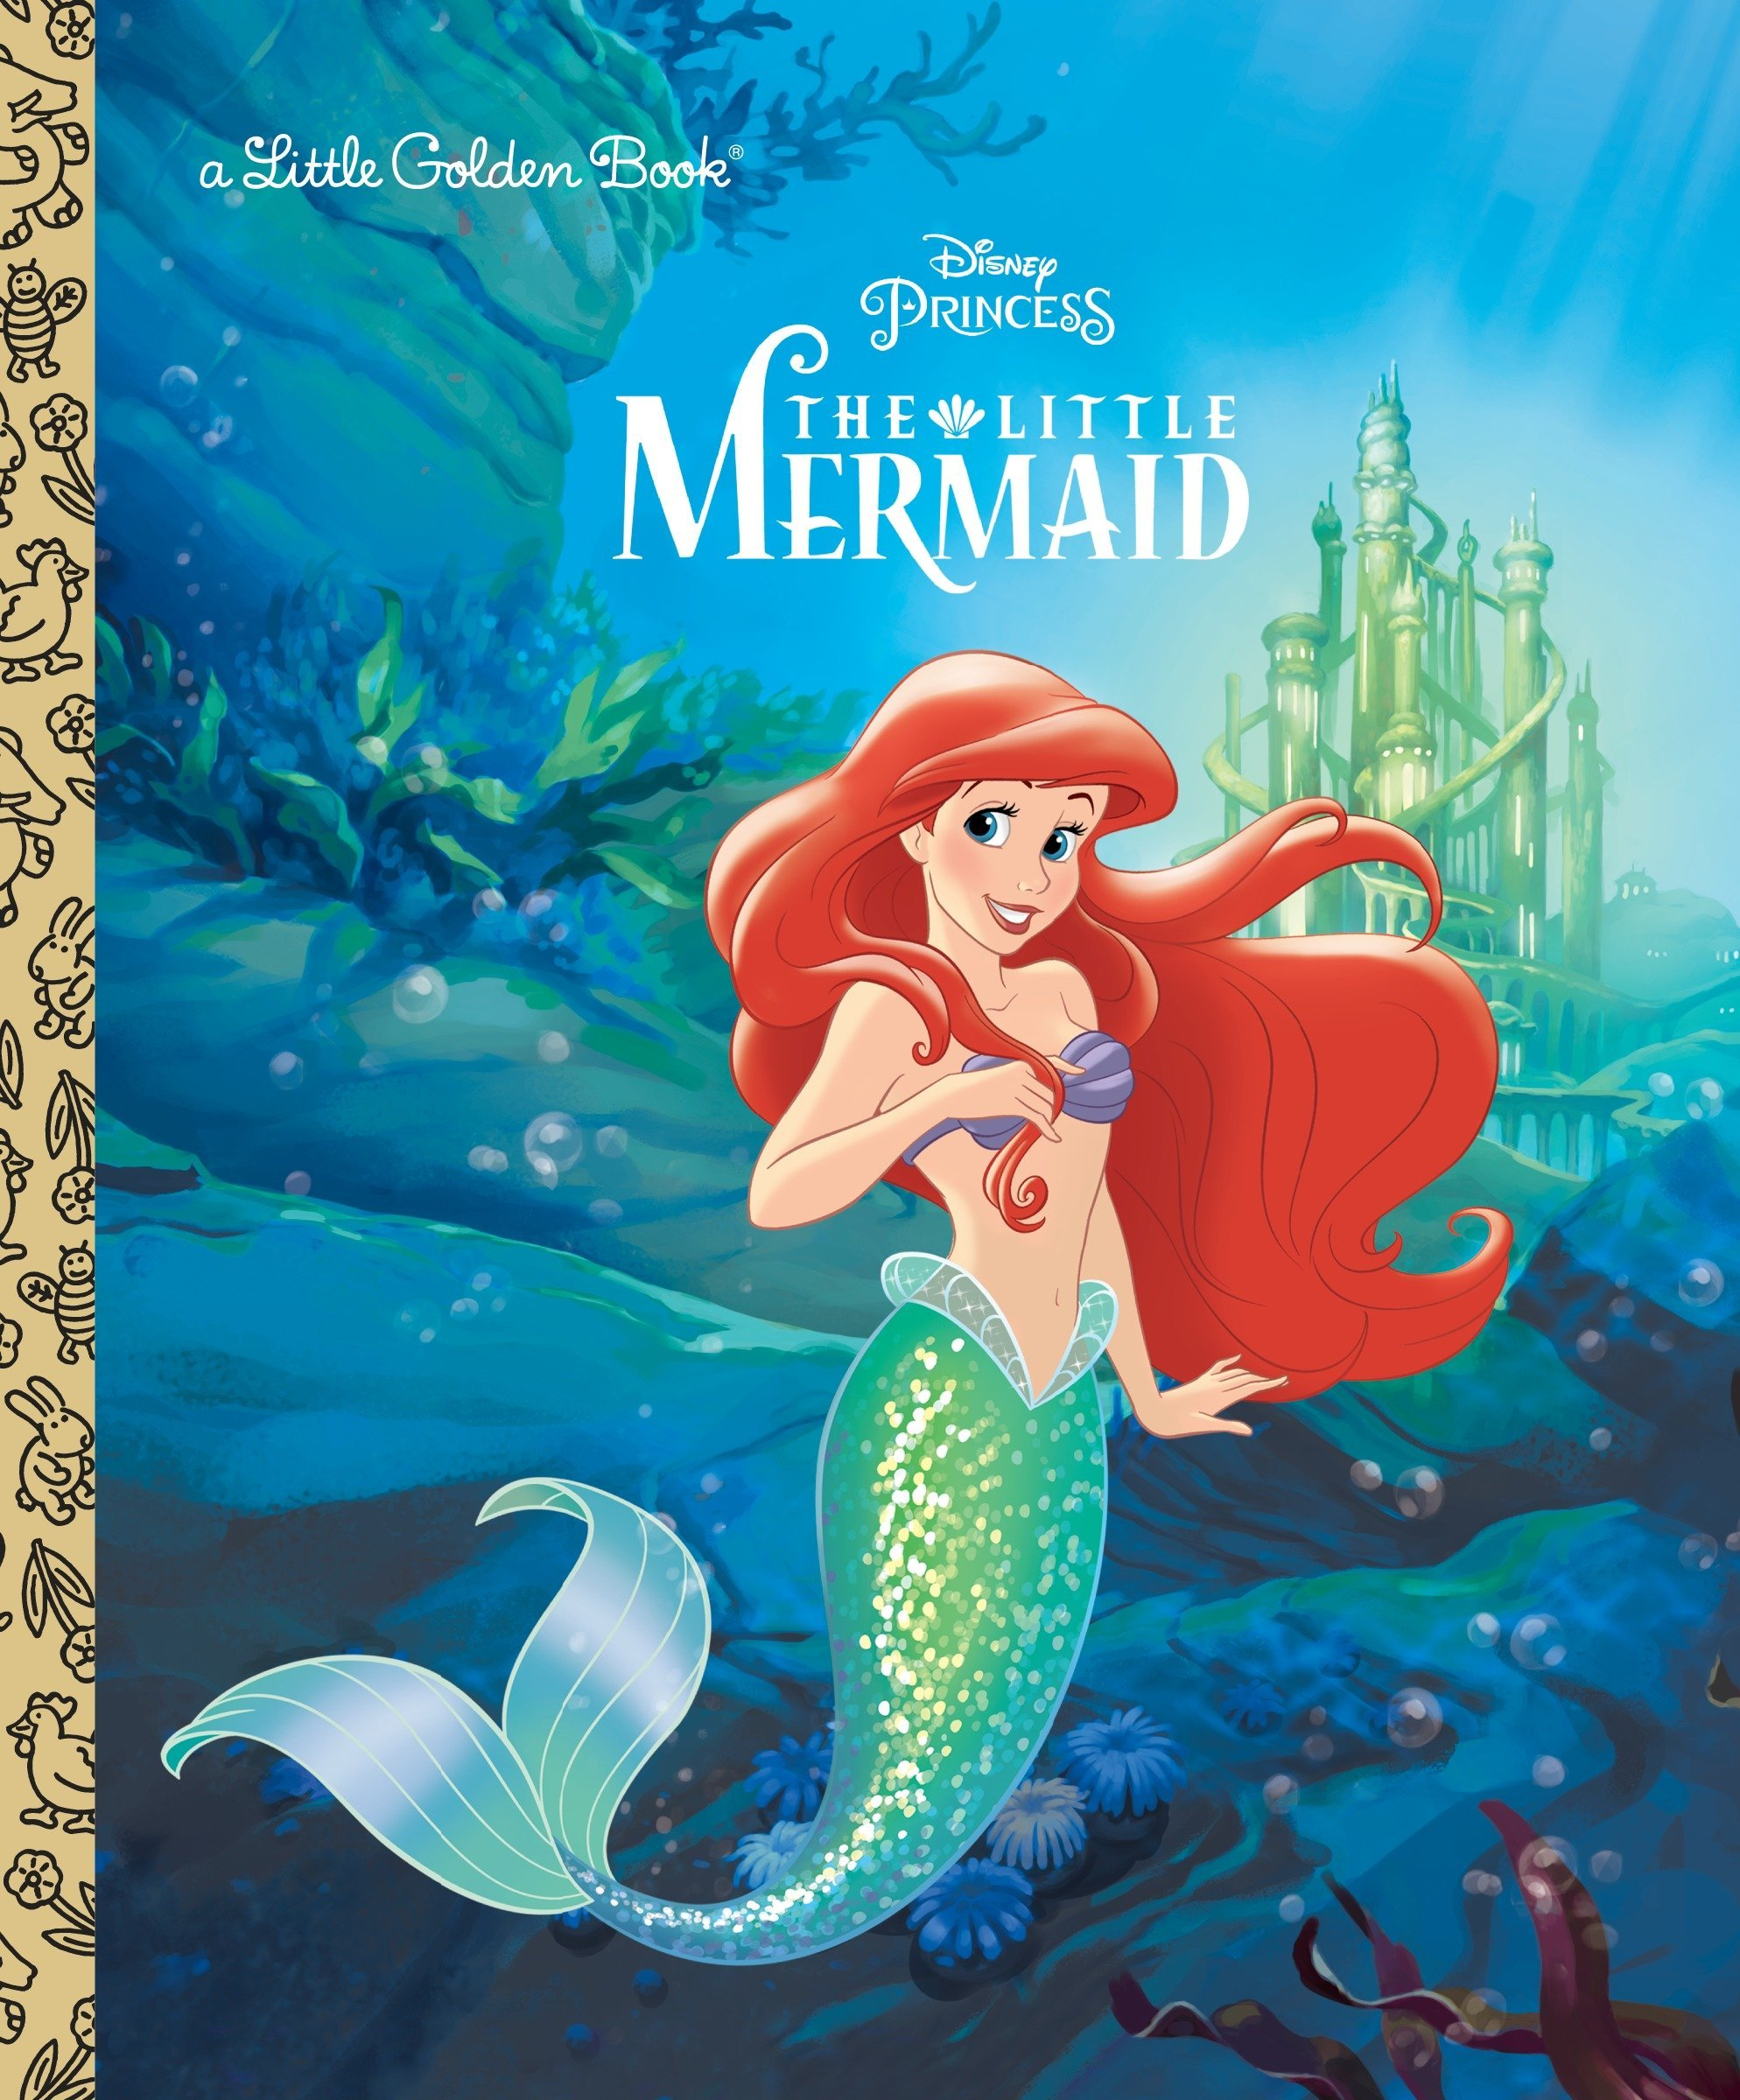 The Little Mermaid Disney Princess Little Golden Book Teitelbaum Michael Dicicco Sue 8601420762459 Amazon Com Books